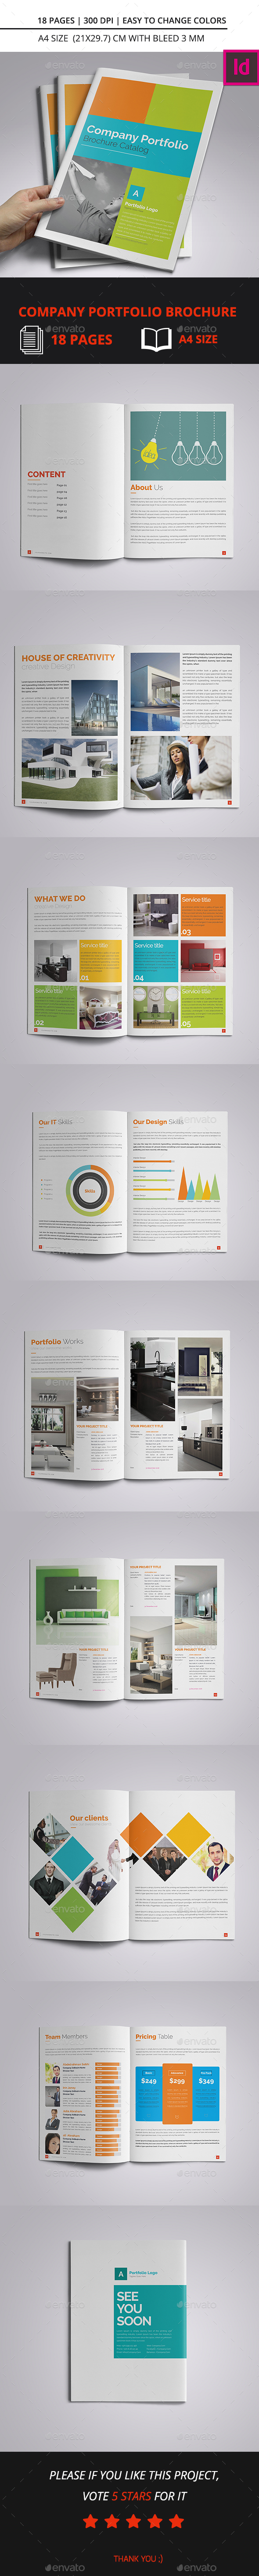 Company Portfolio Brochure Catalog A4 - Corporate Brochures